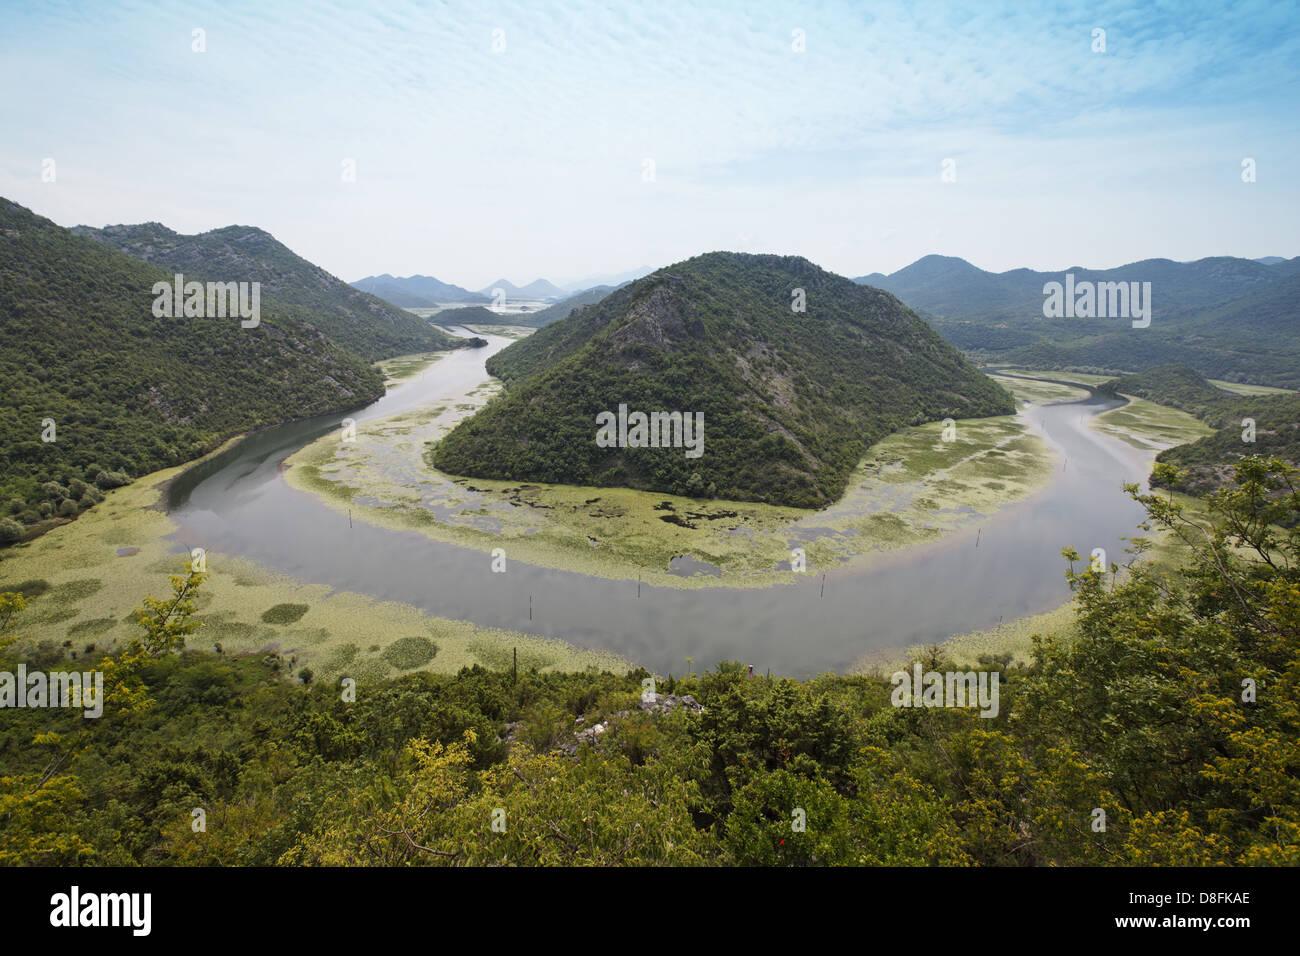 Nahe Fluss Stock Photos & Nahe Fluss Stock Images - Alamy